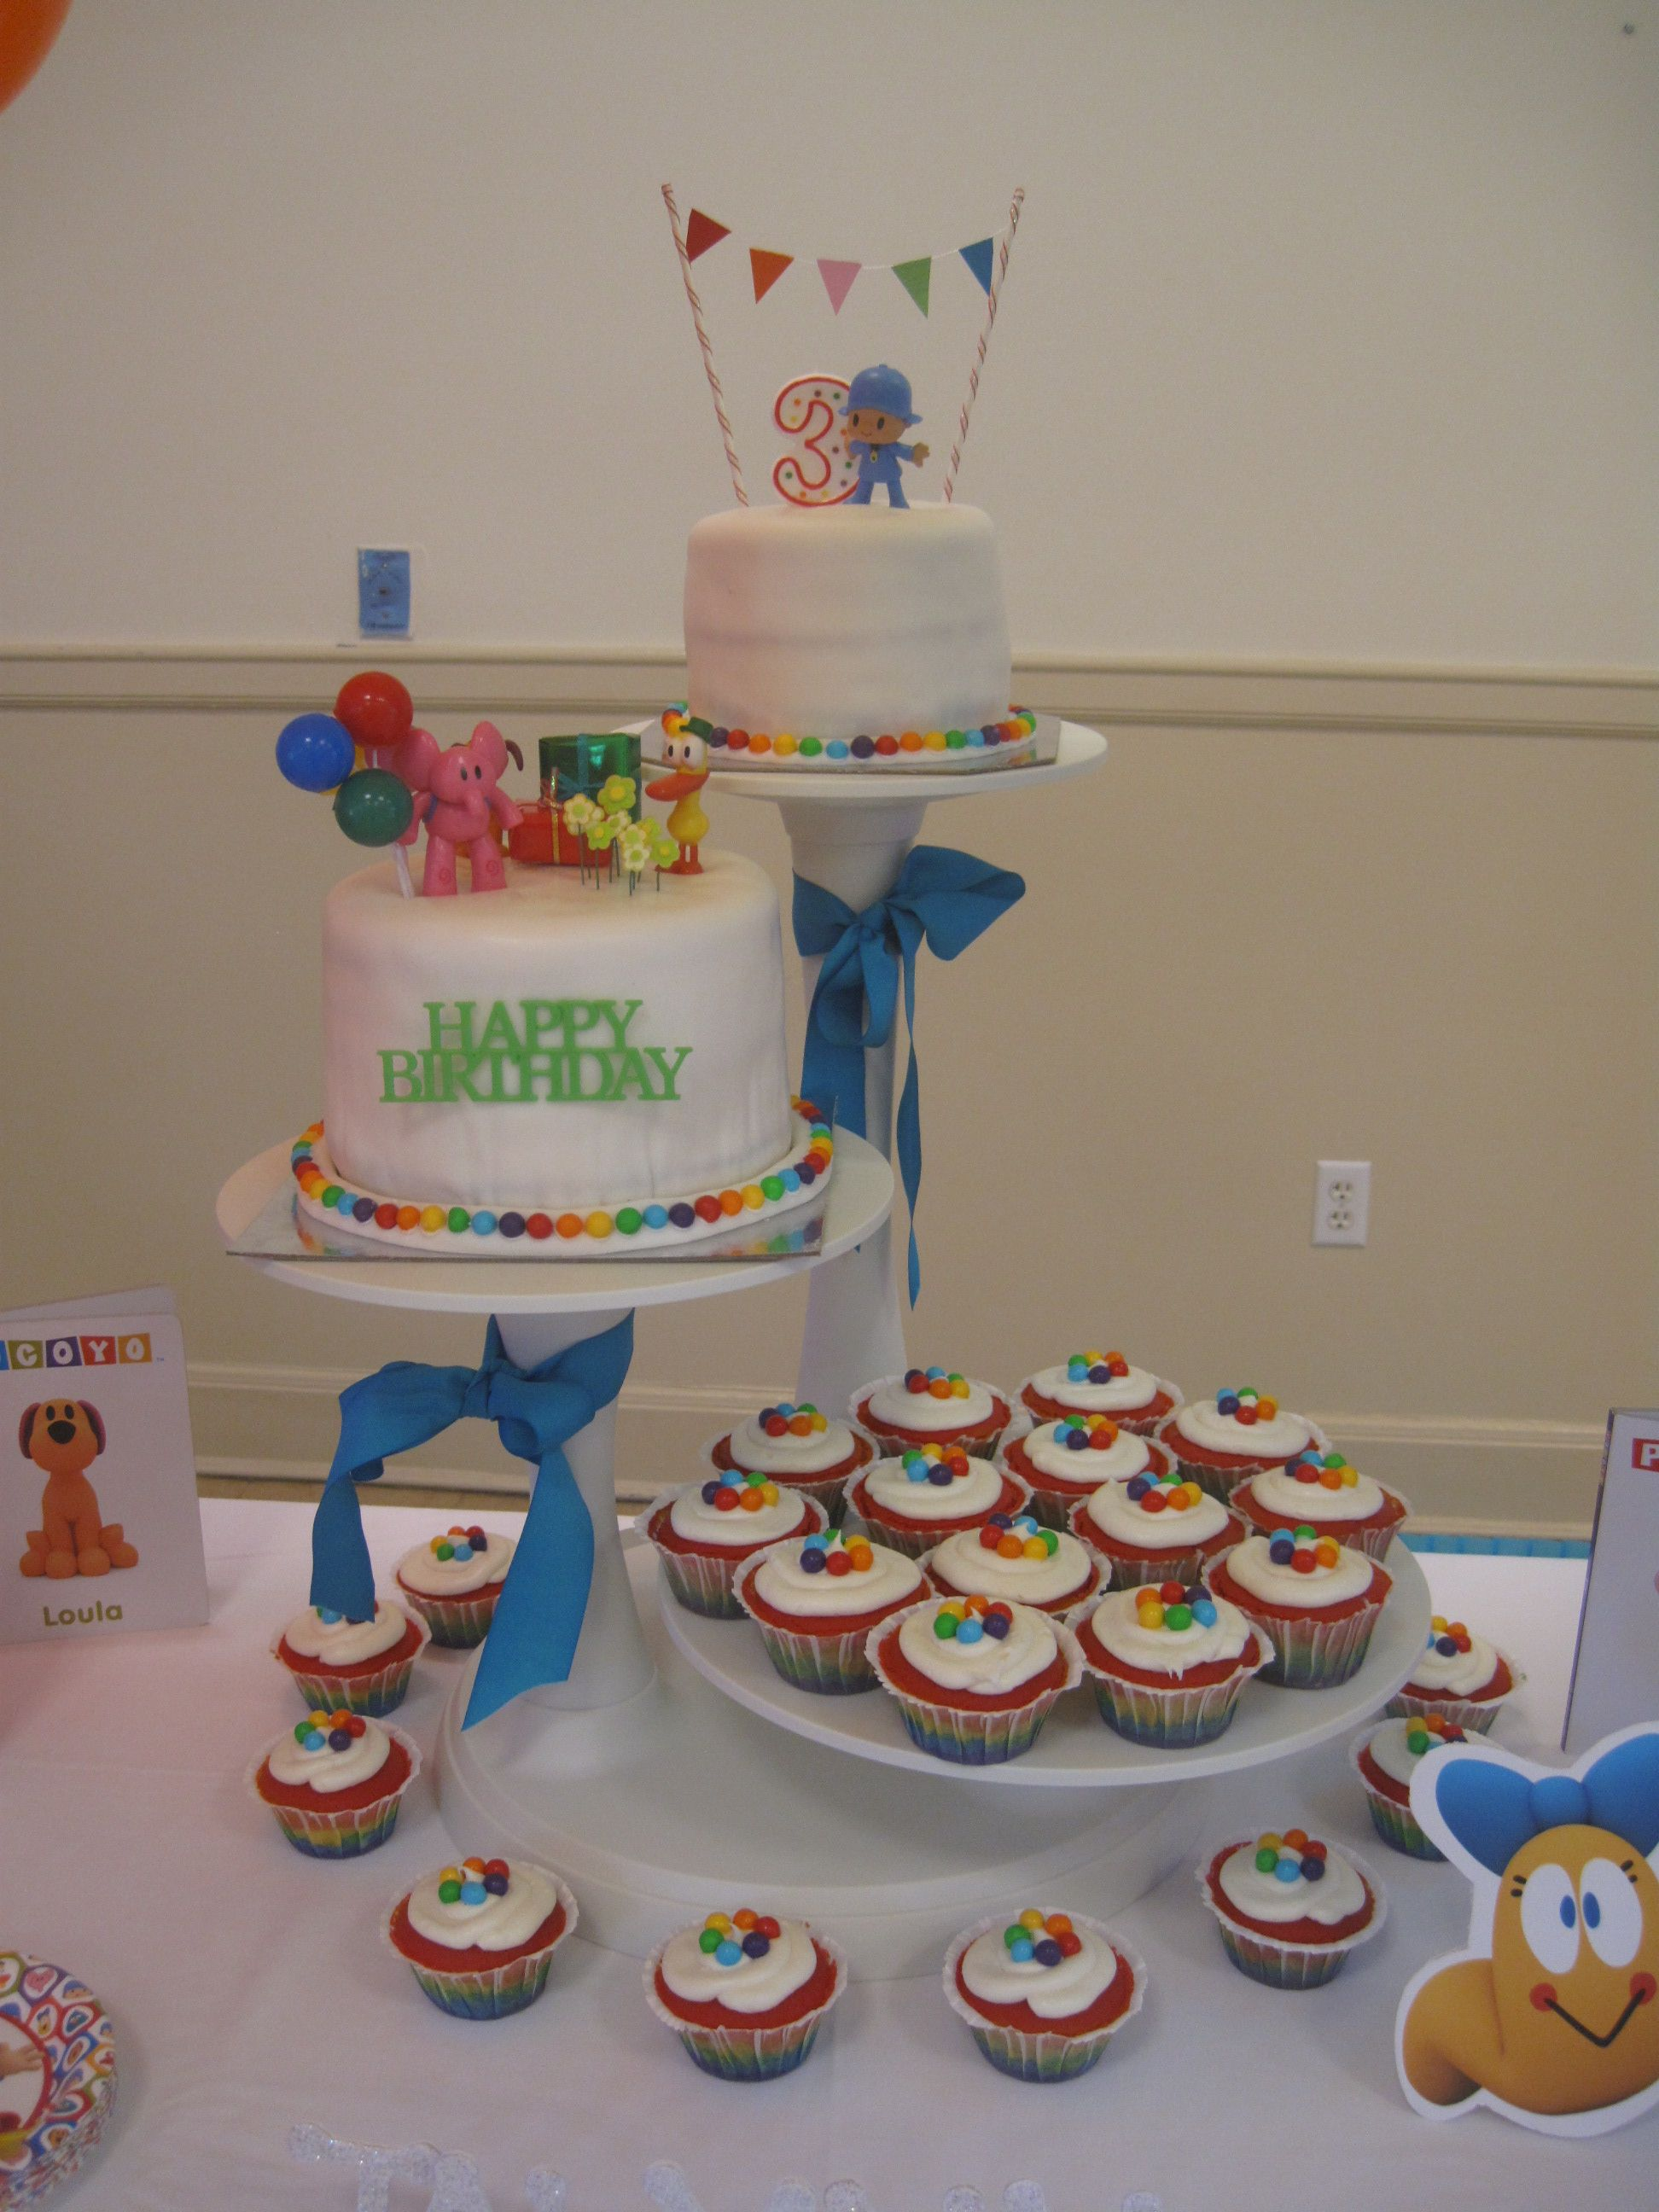 Pocoyo birthday cake primary color cupcakes with rainbow layers